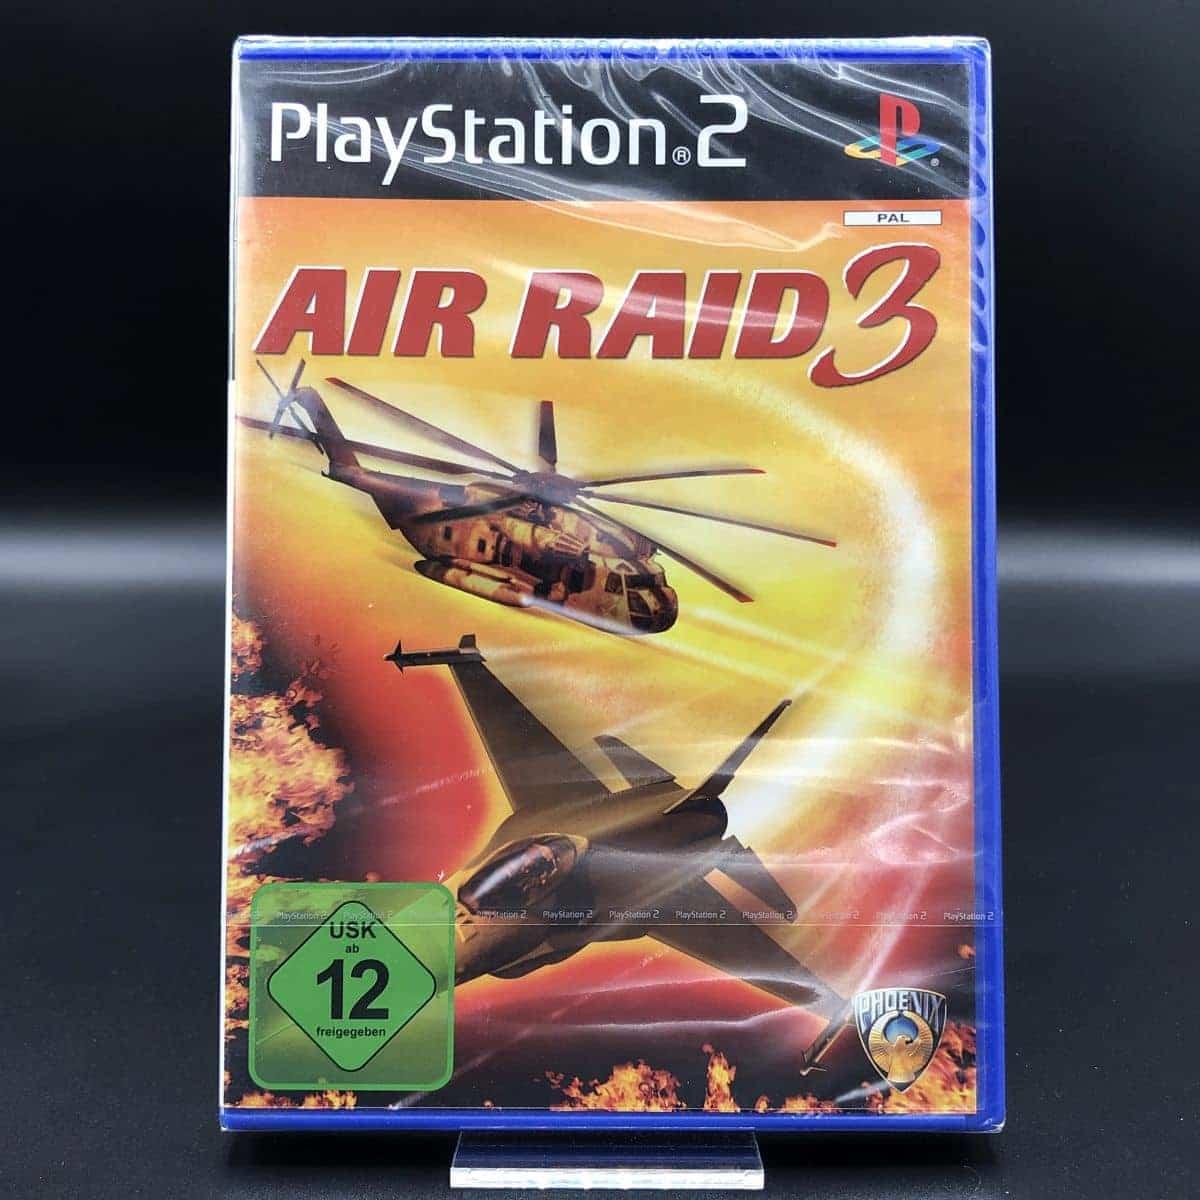 PS2 Air Raid 3 (NEU) Sony PlayStation 2